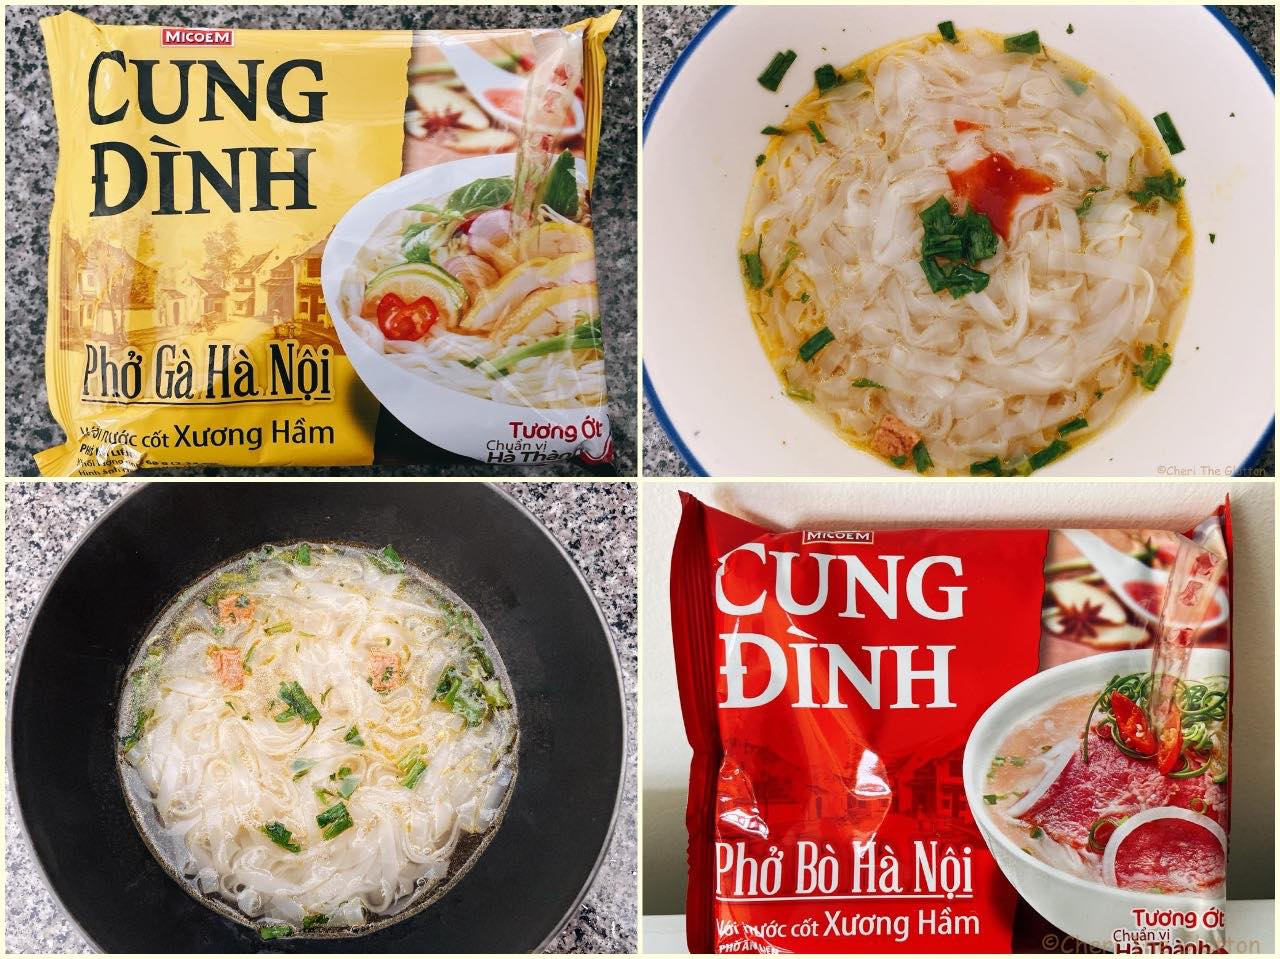 Cung Dinh